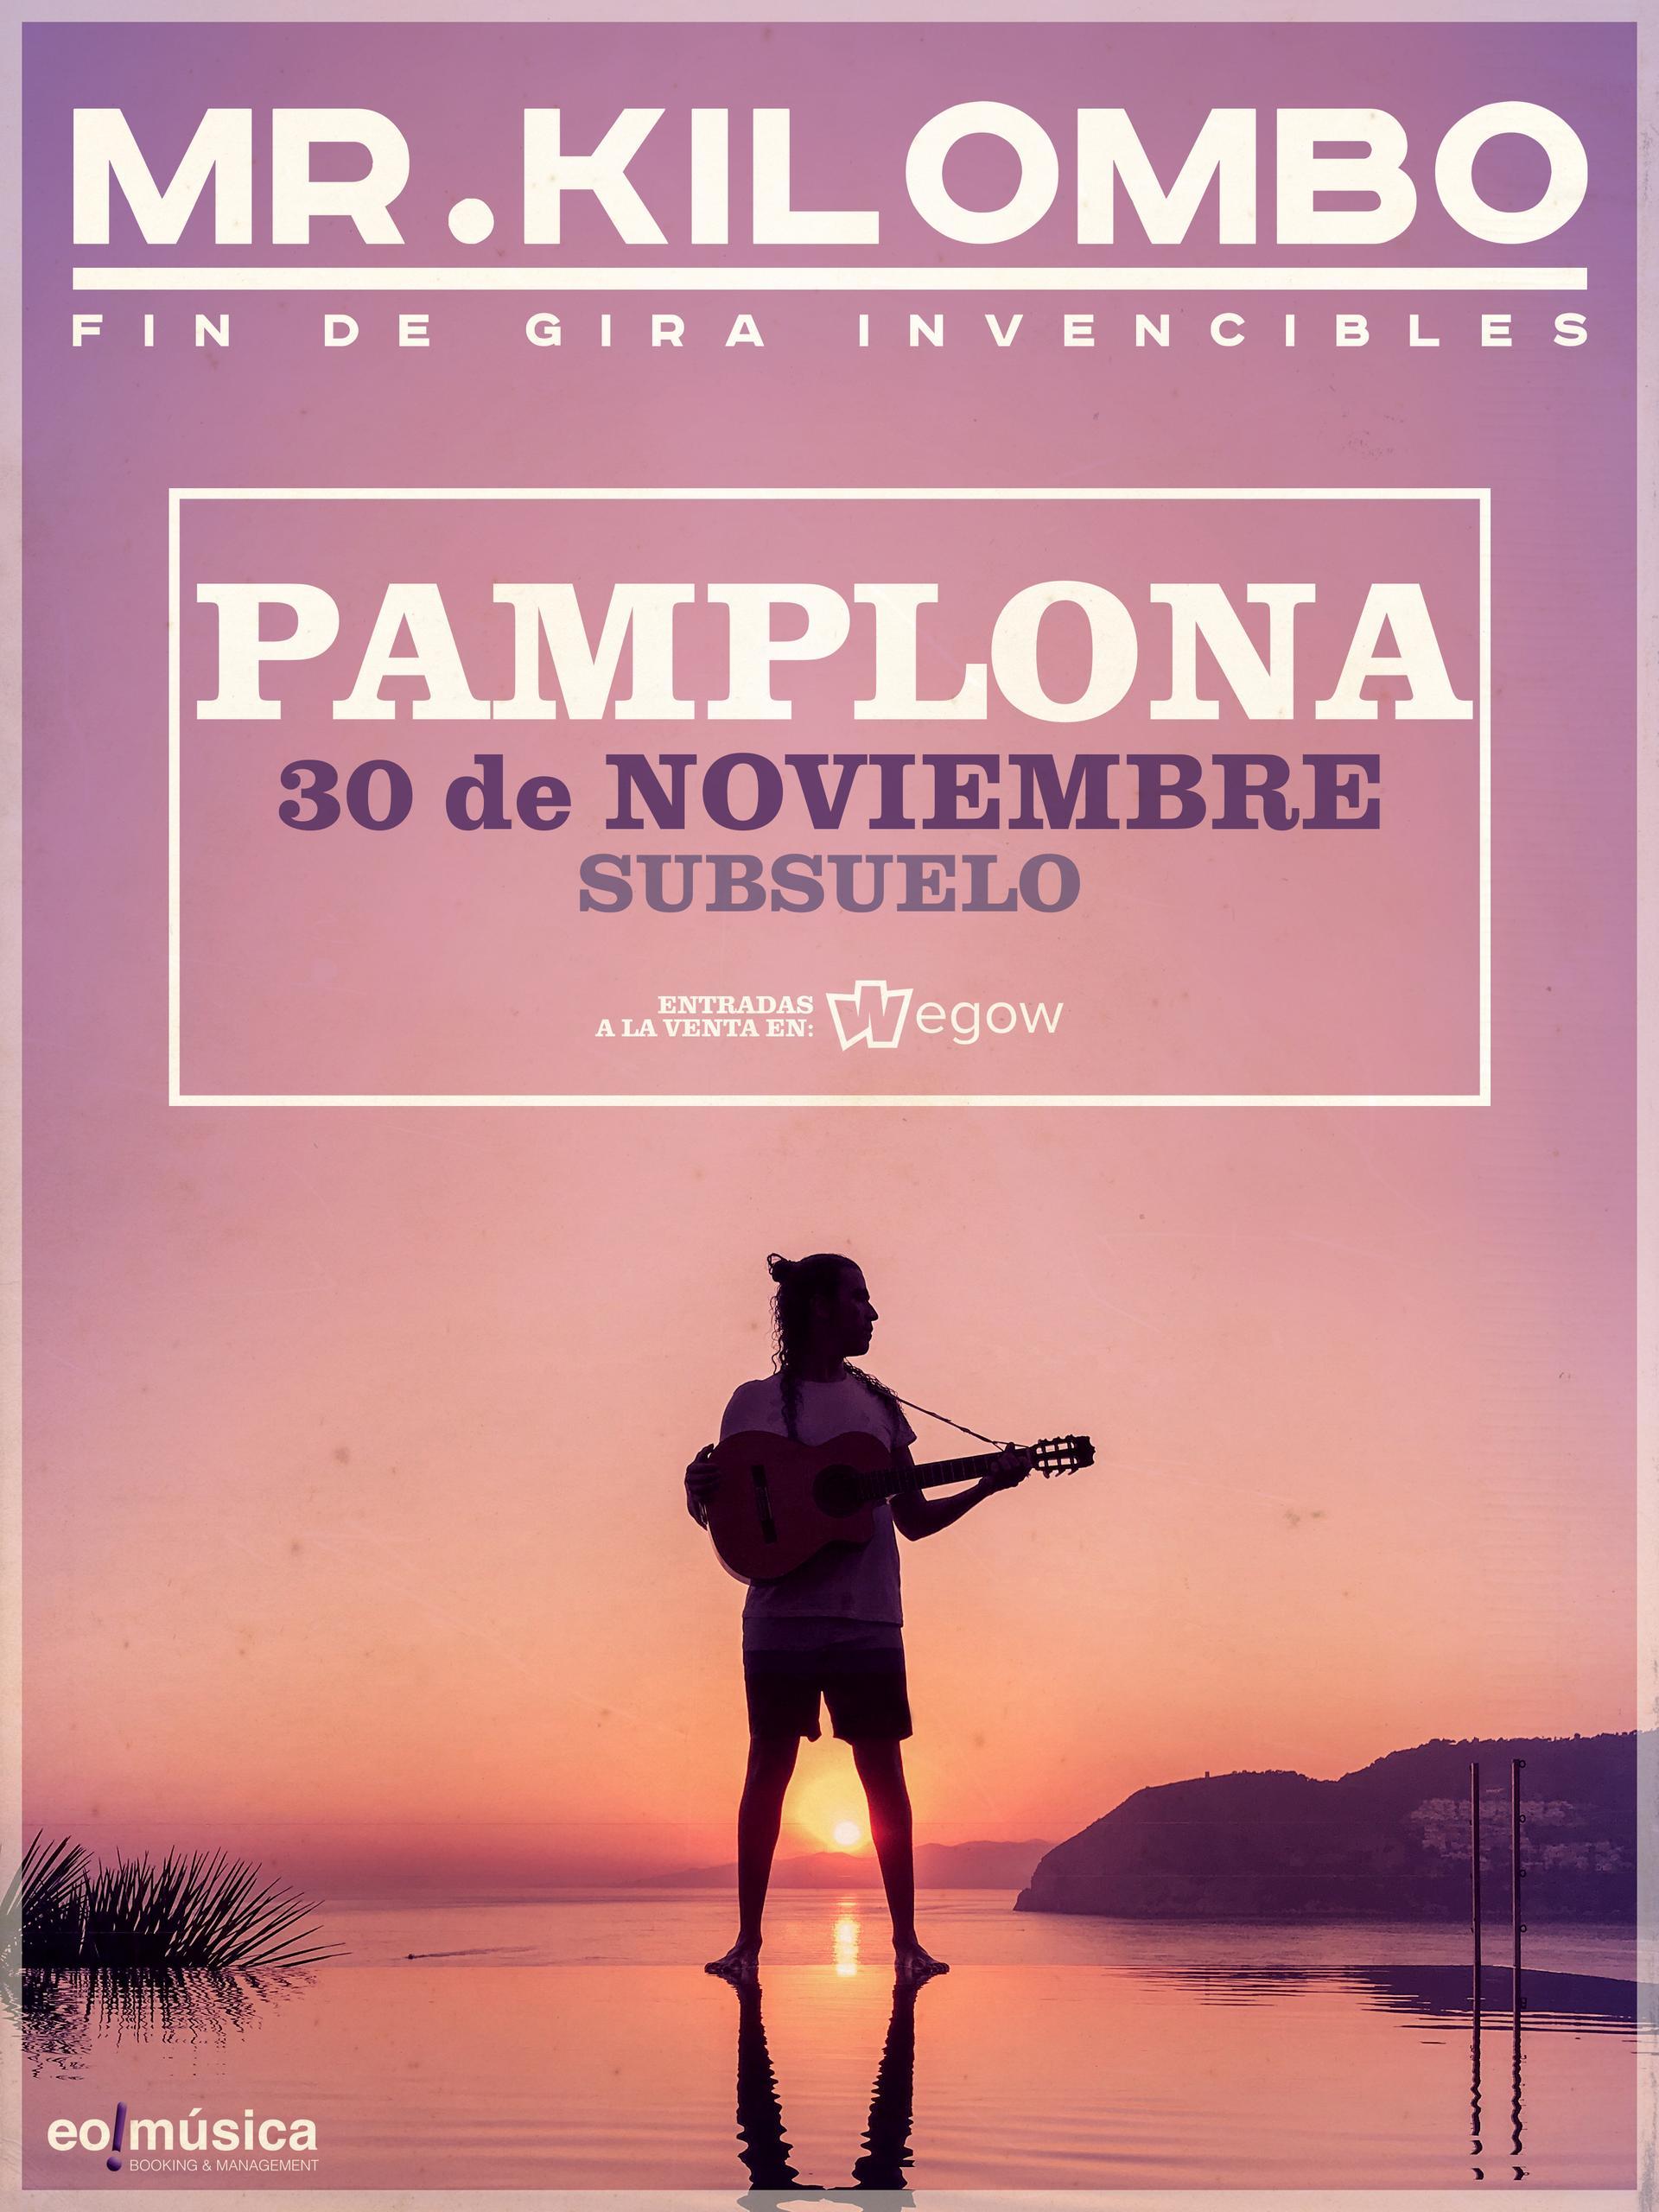 Concierto de Mr. Kilombo en Pamplona